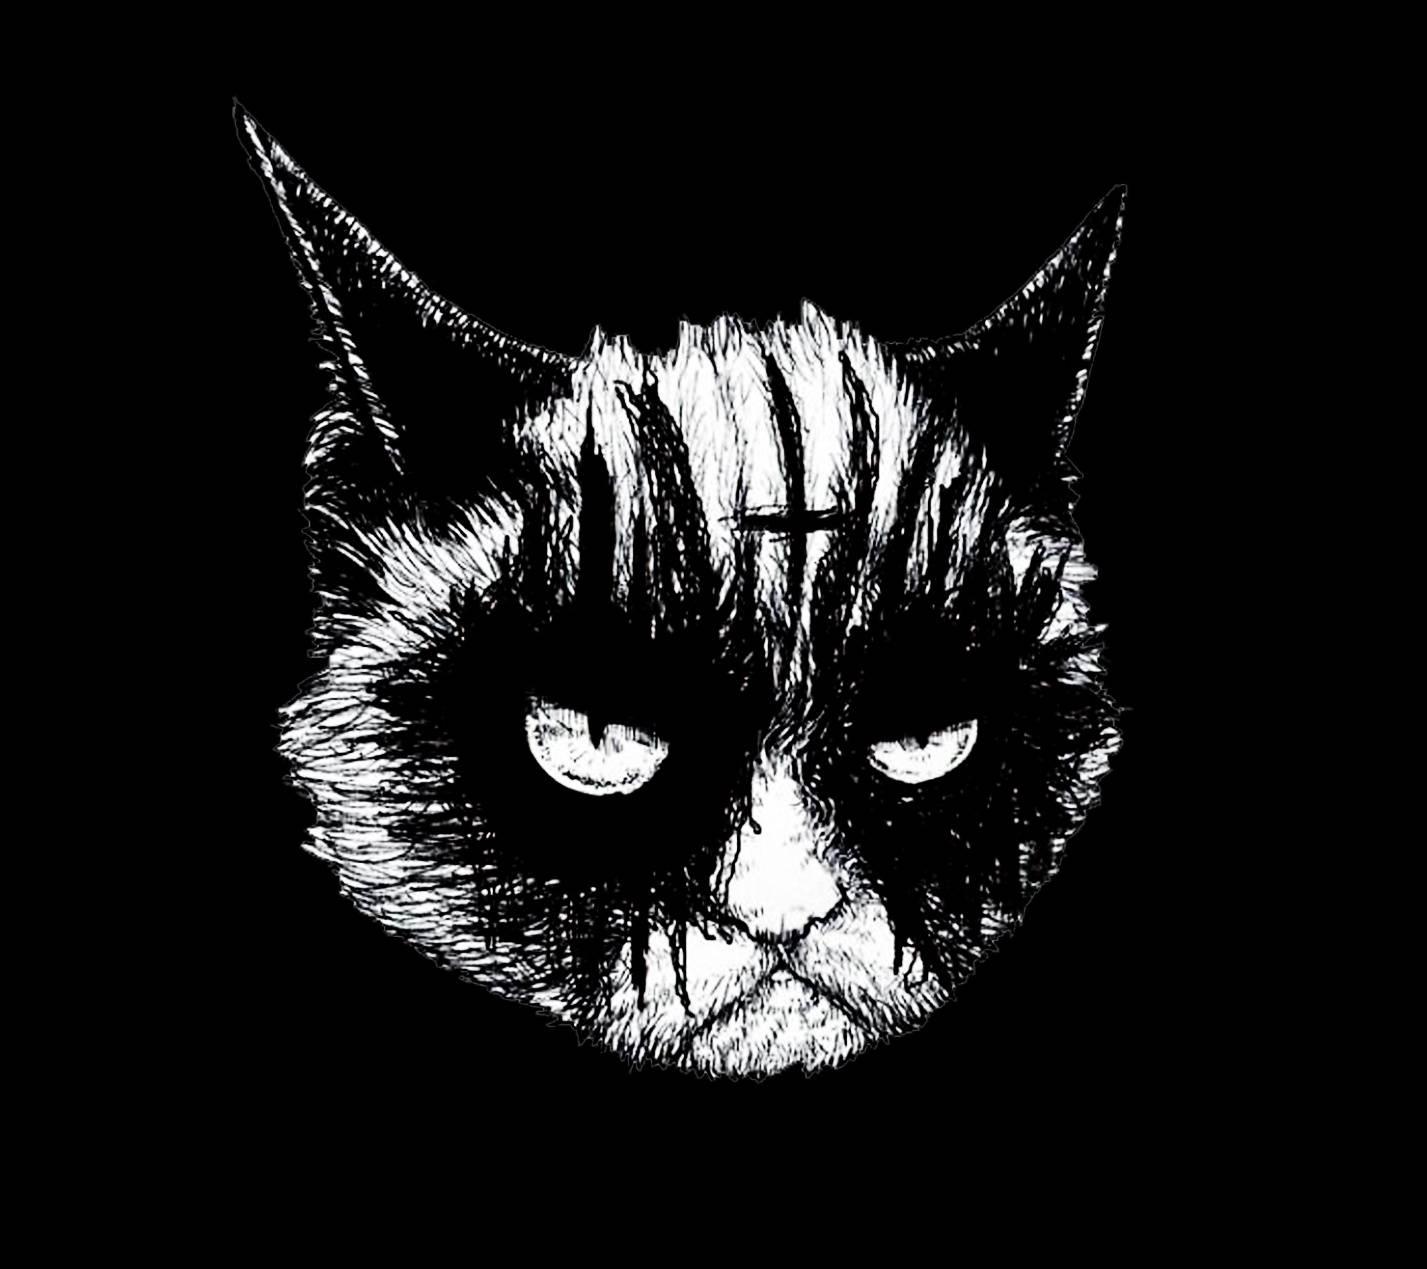 Black Metal Cat Wallpaper By Omargenis 23 Free On Zedge